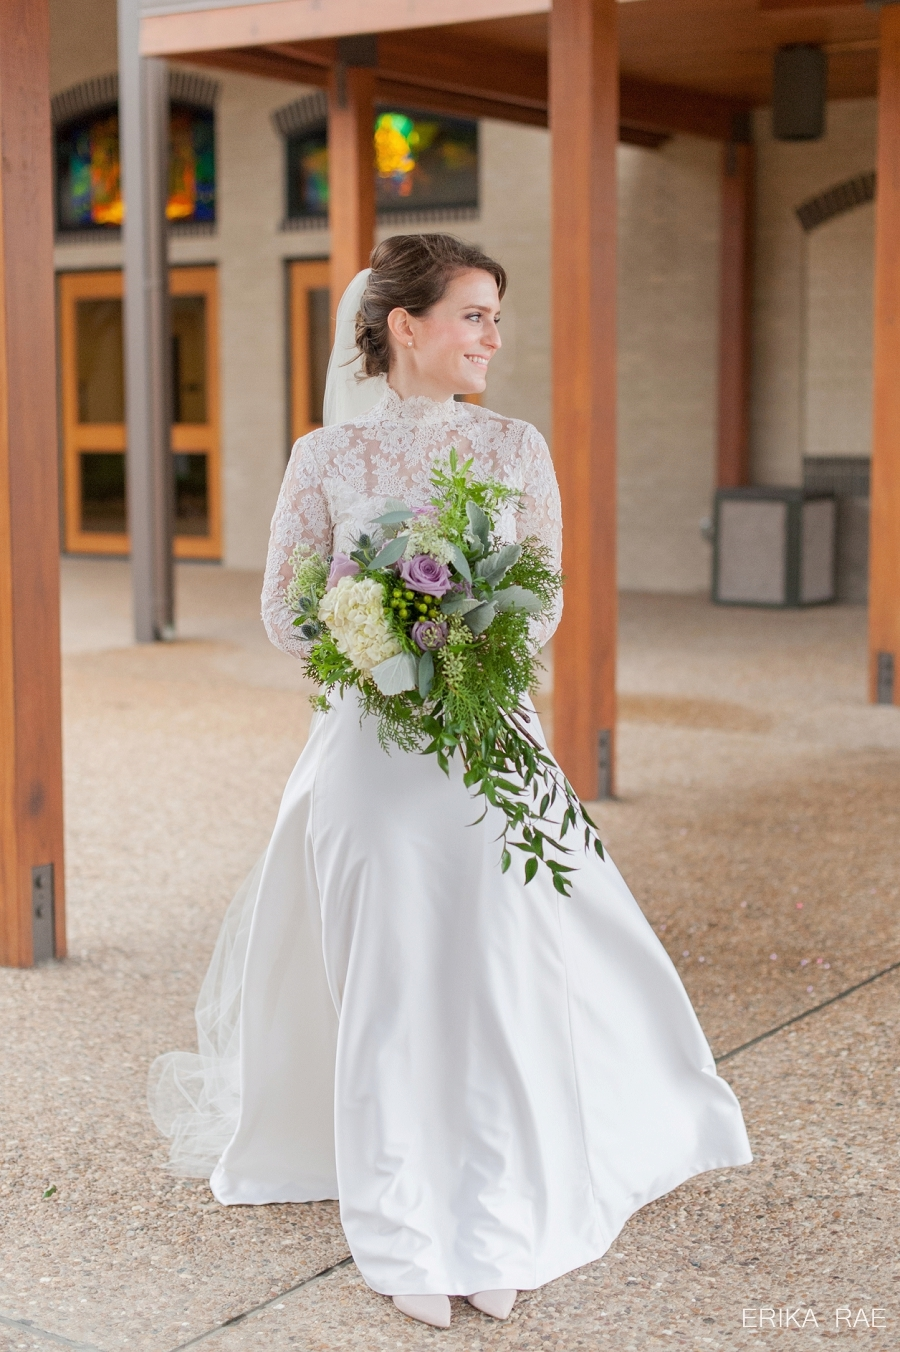 Ouisies_Table_Houston_Wedding_0006.jpg